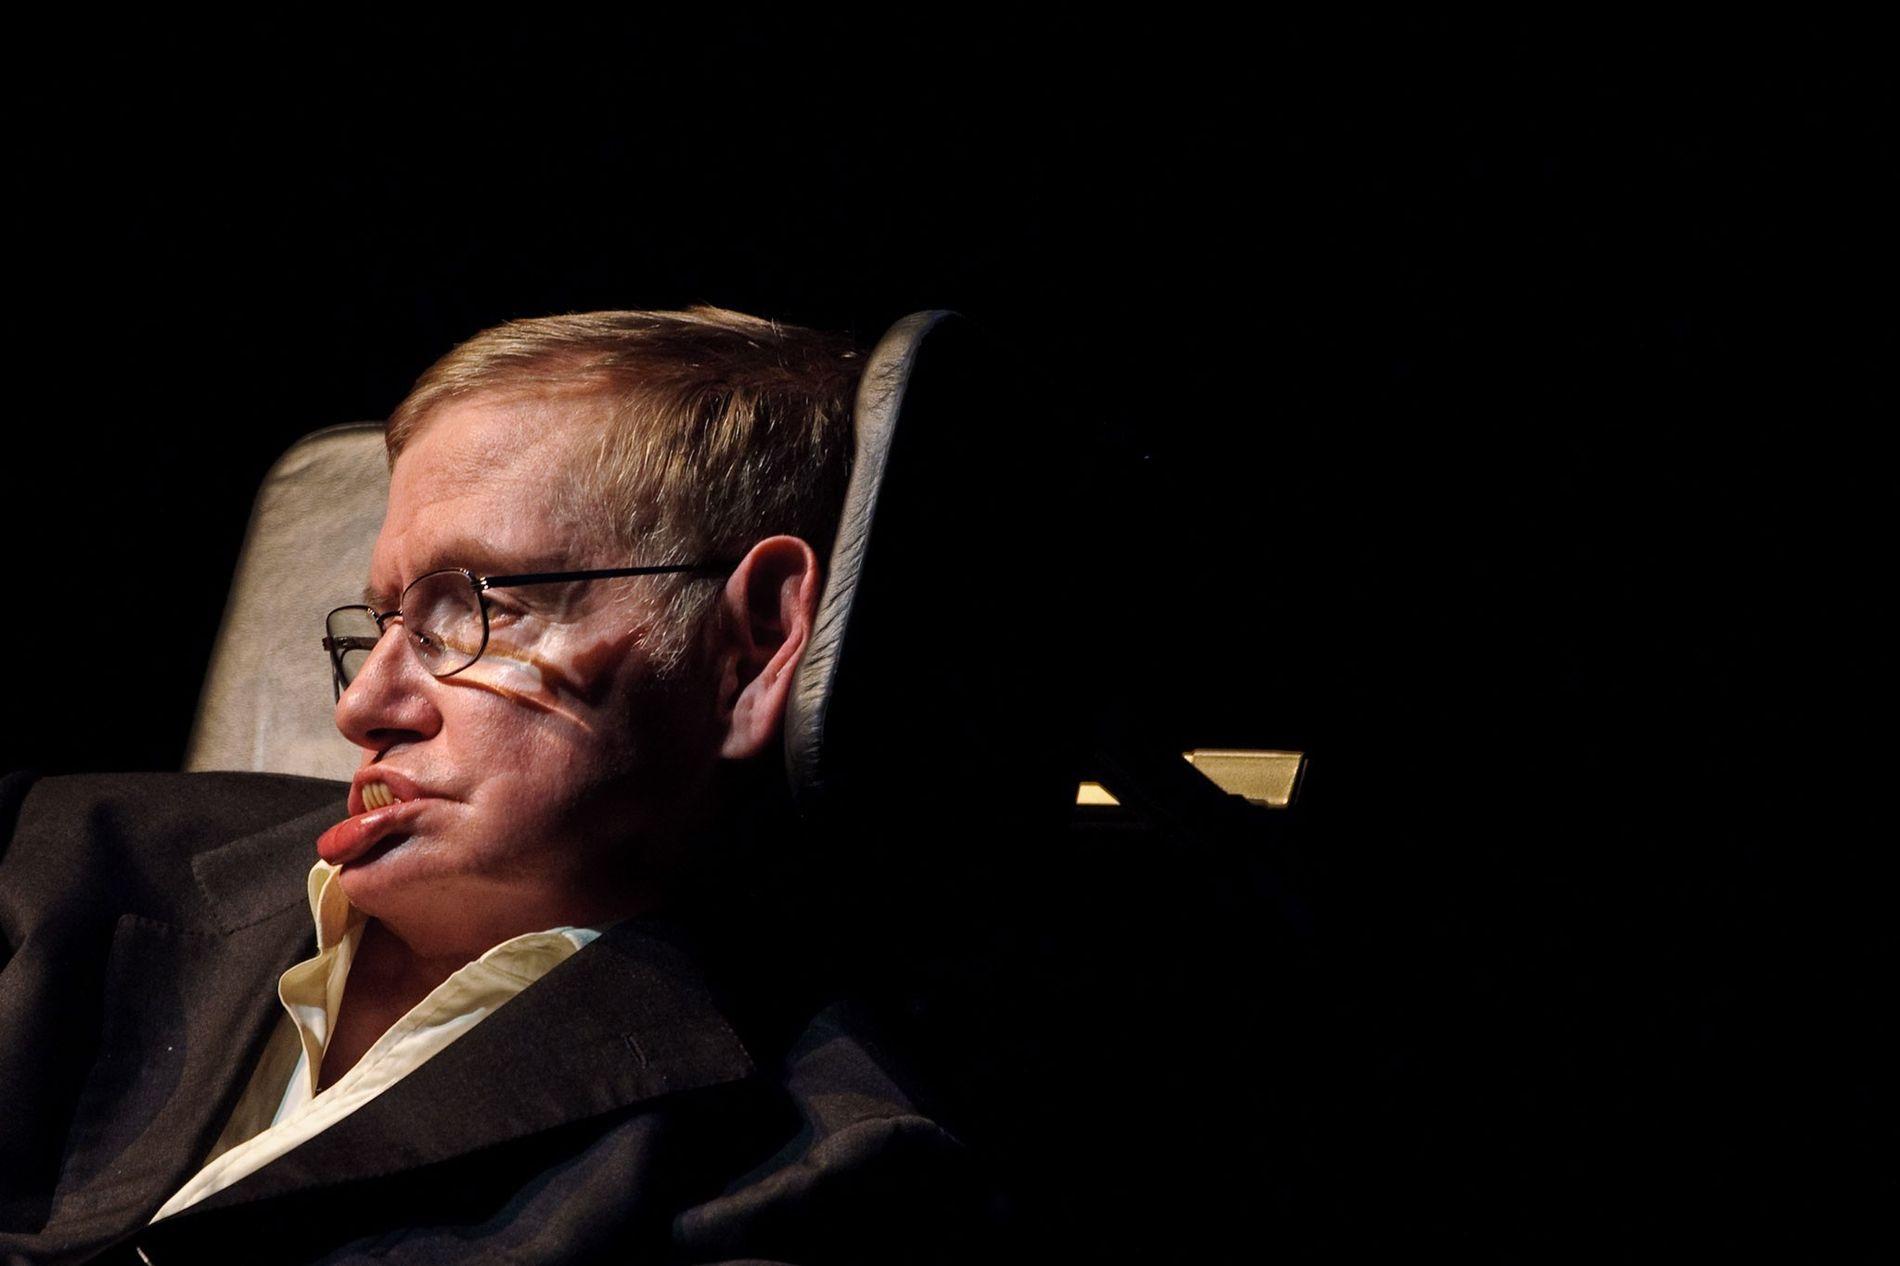 Stephen Hawkings provokanteste Momente